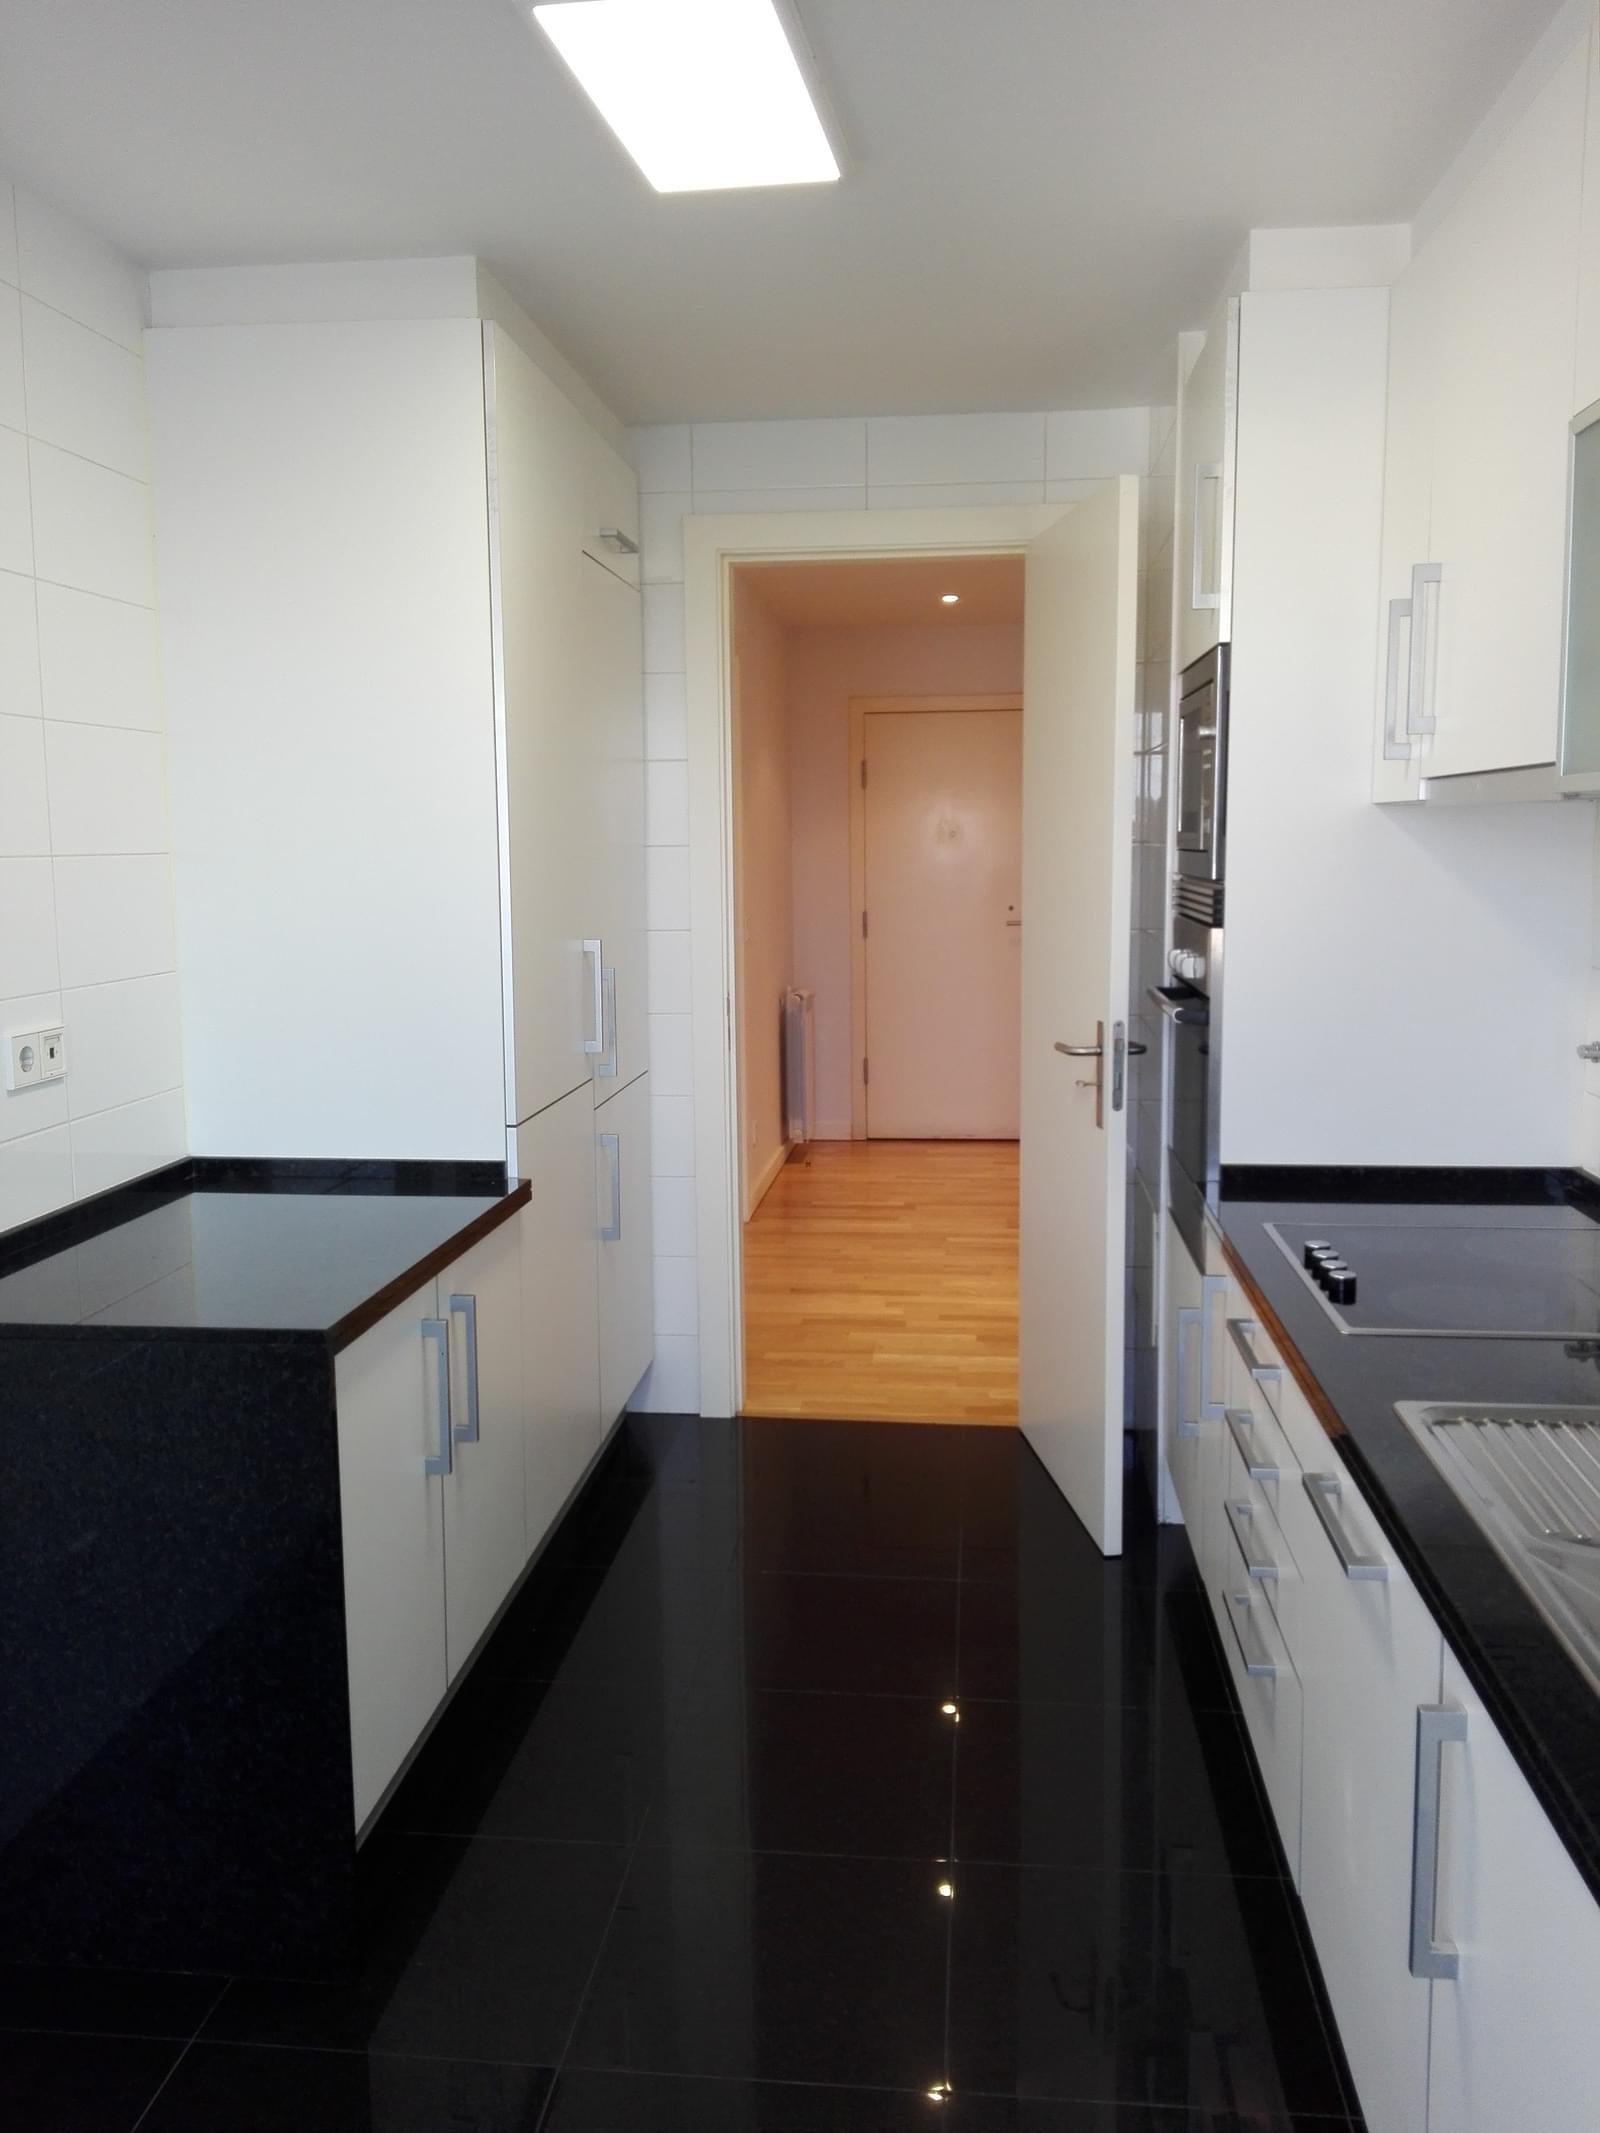 pf18814-apartamento-t2-lisboa-8ba062e8-389a-492b-948b-e90e4b1cf2c9